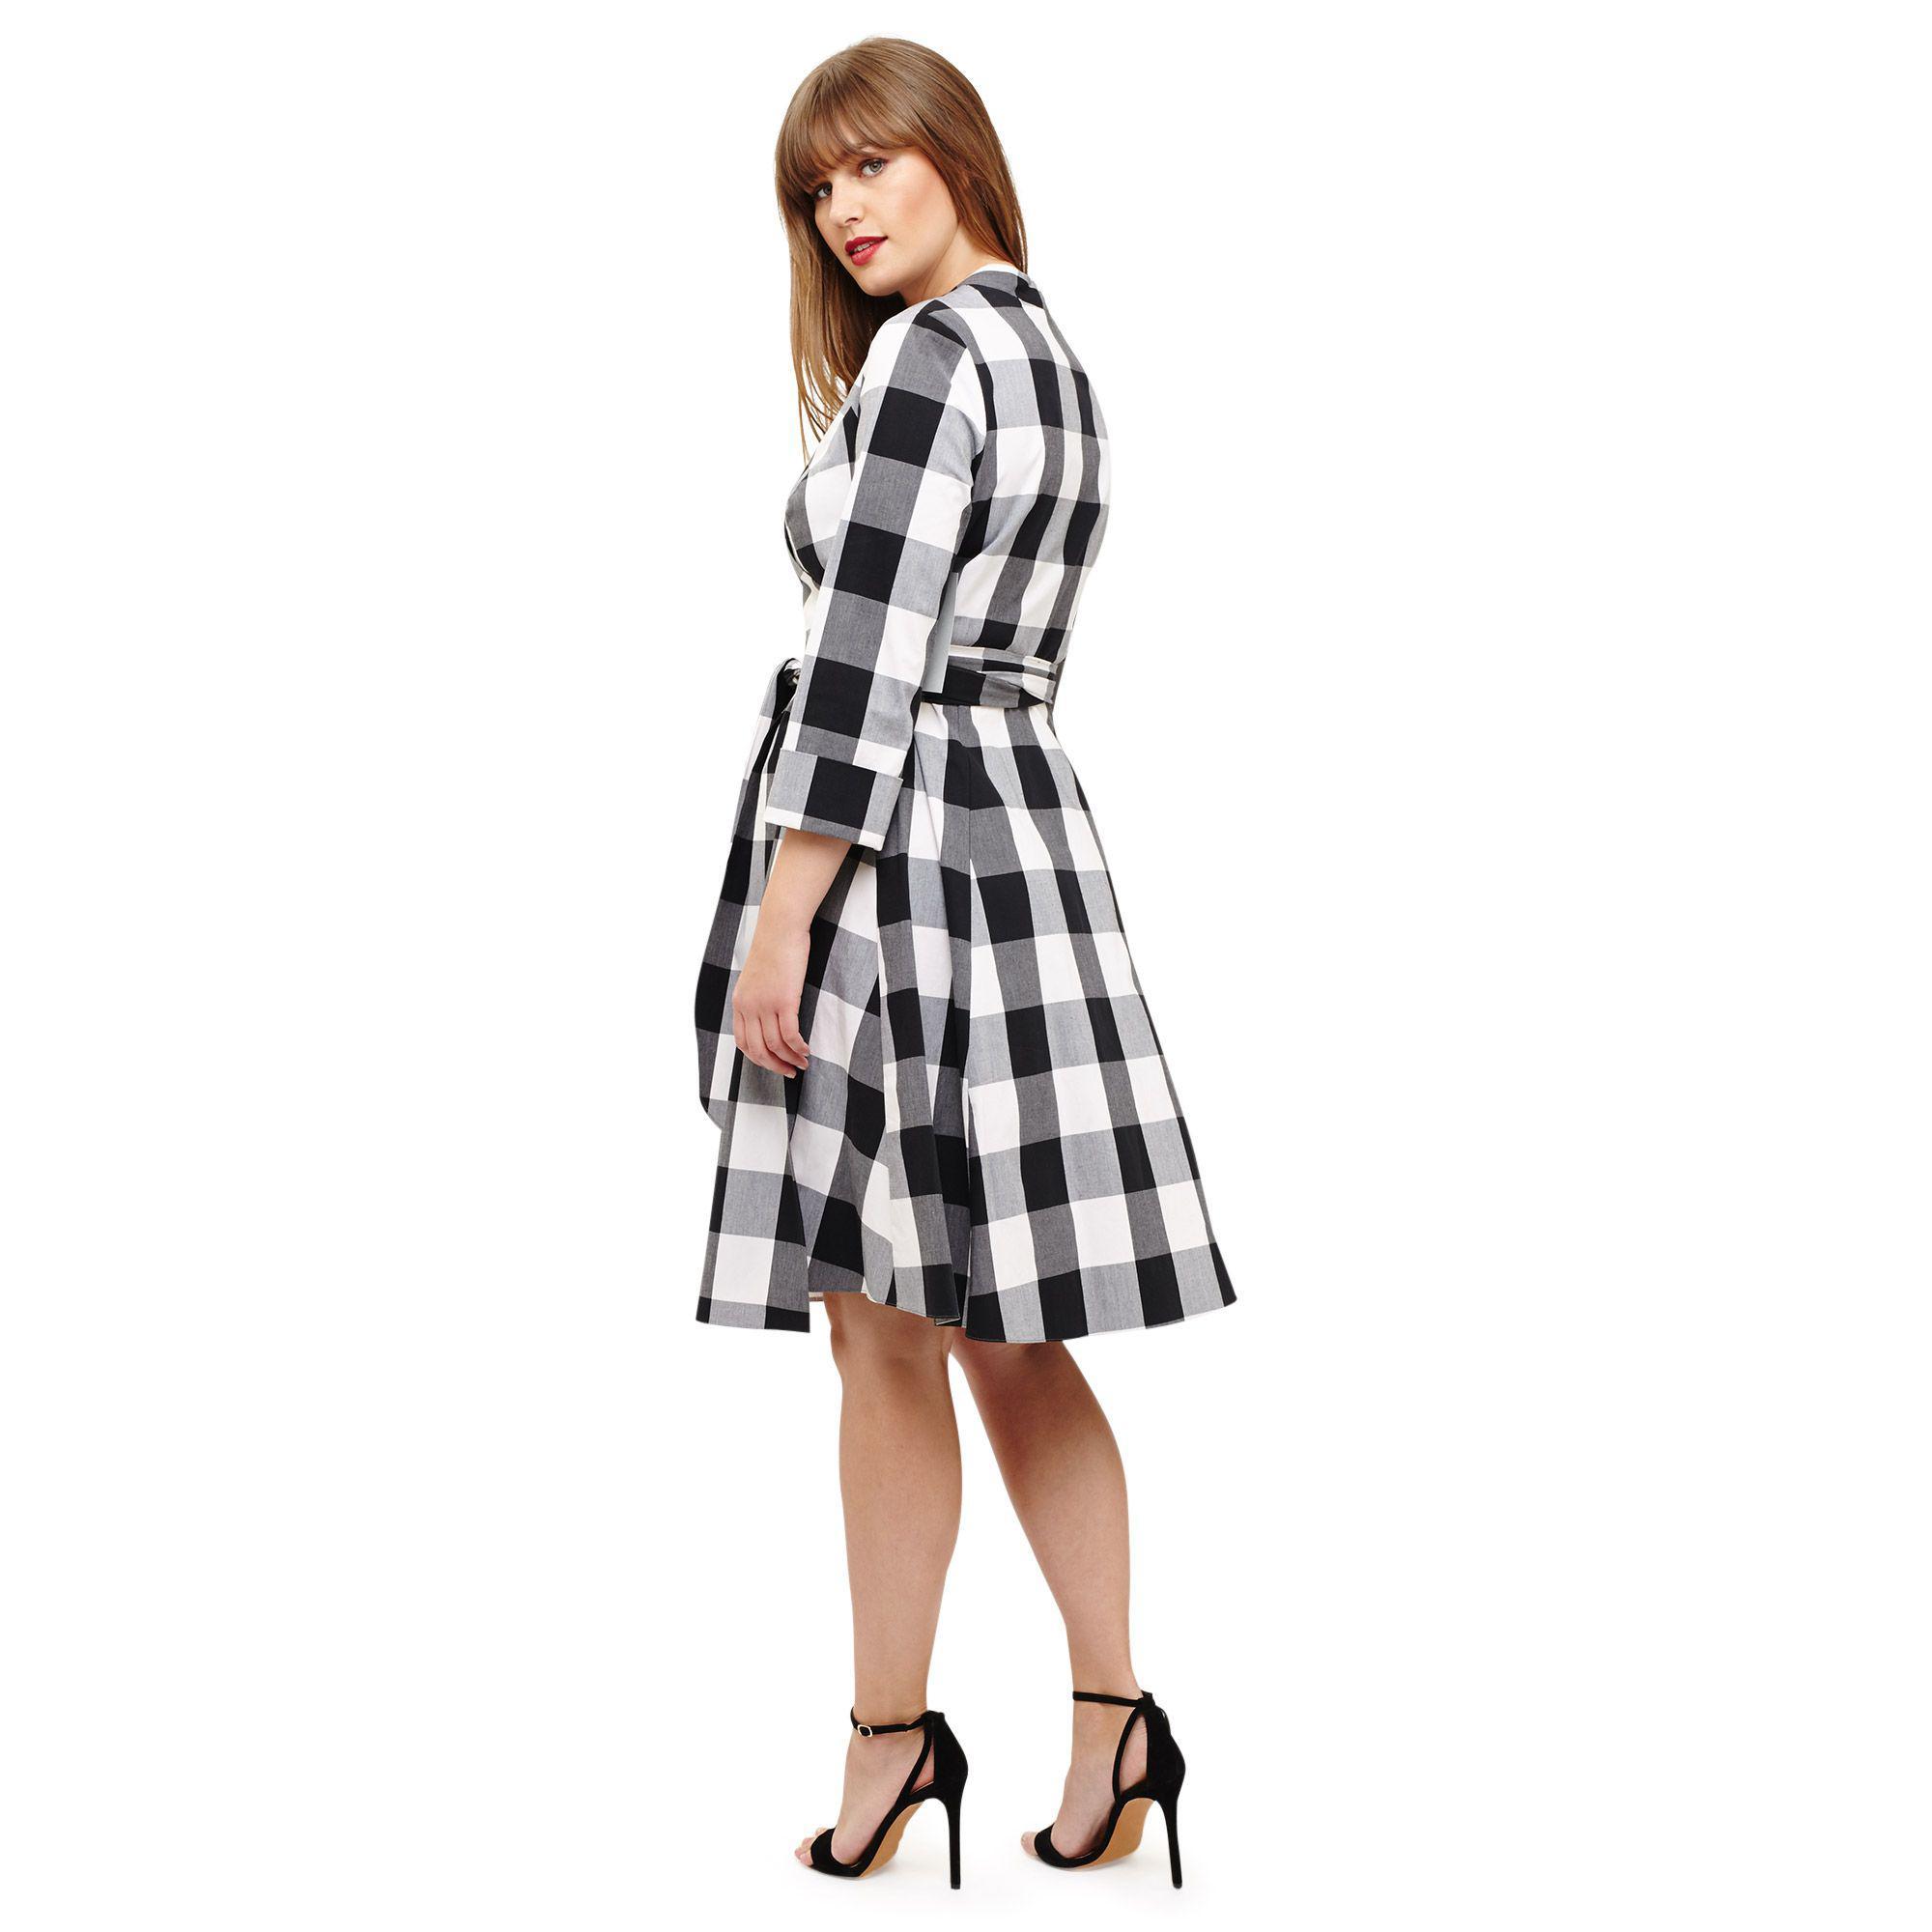 f8475fea28690 Studio 8 - Sizes 12-26 Black Alice Gingham Dress - Lyst. View fullscreen